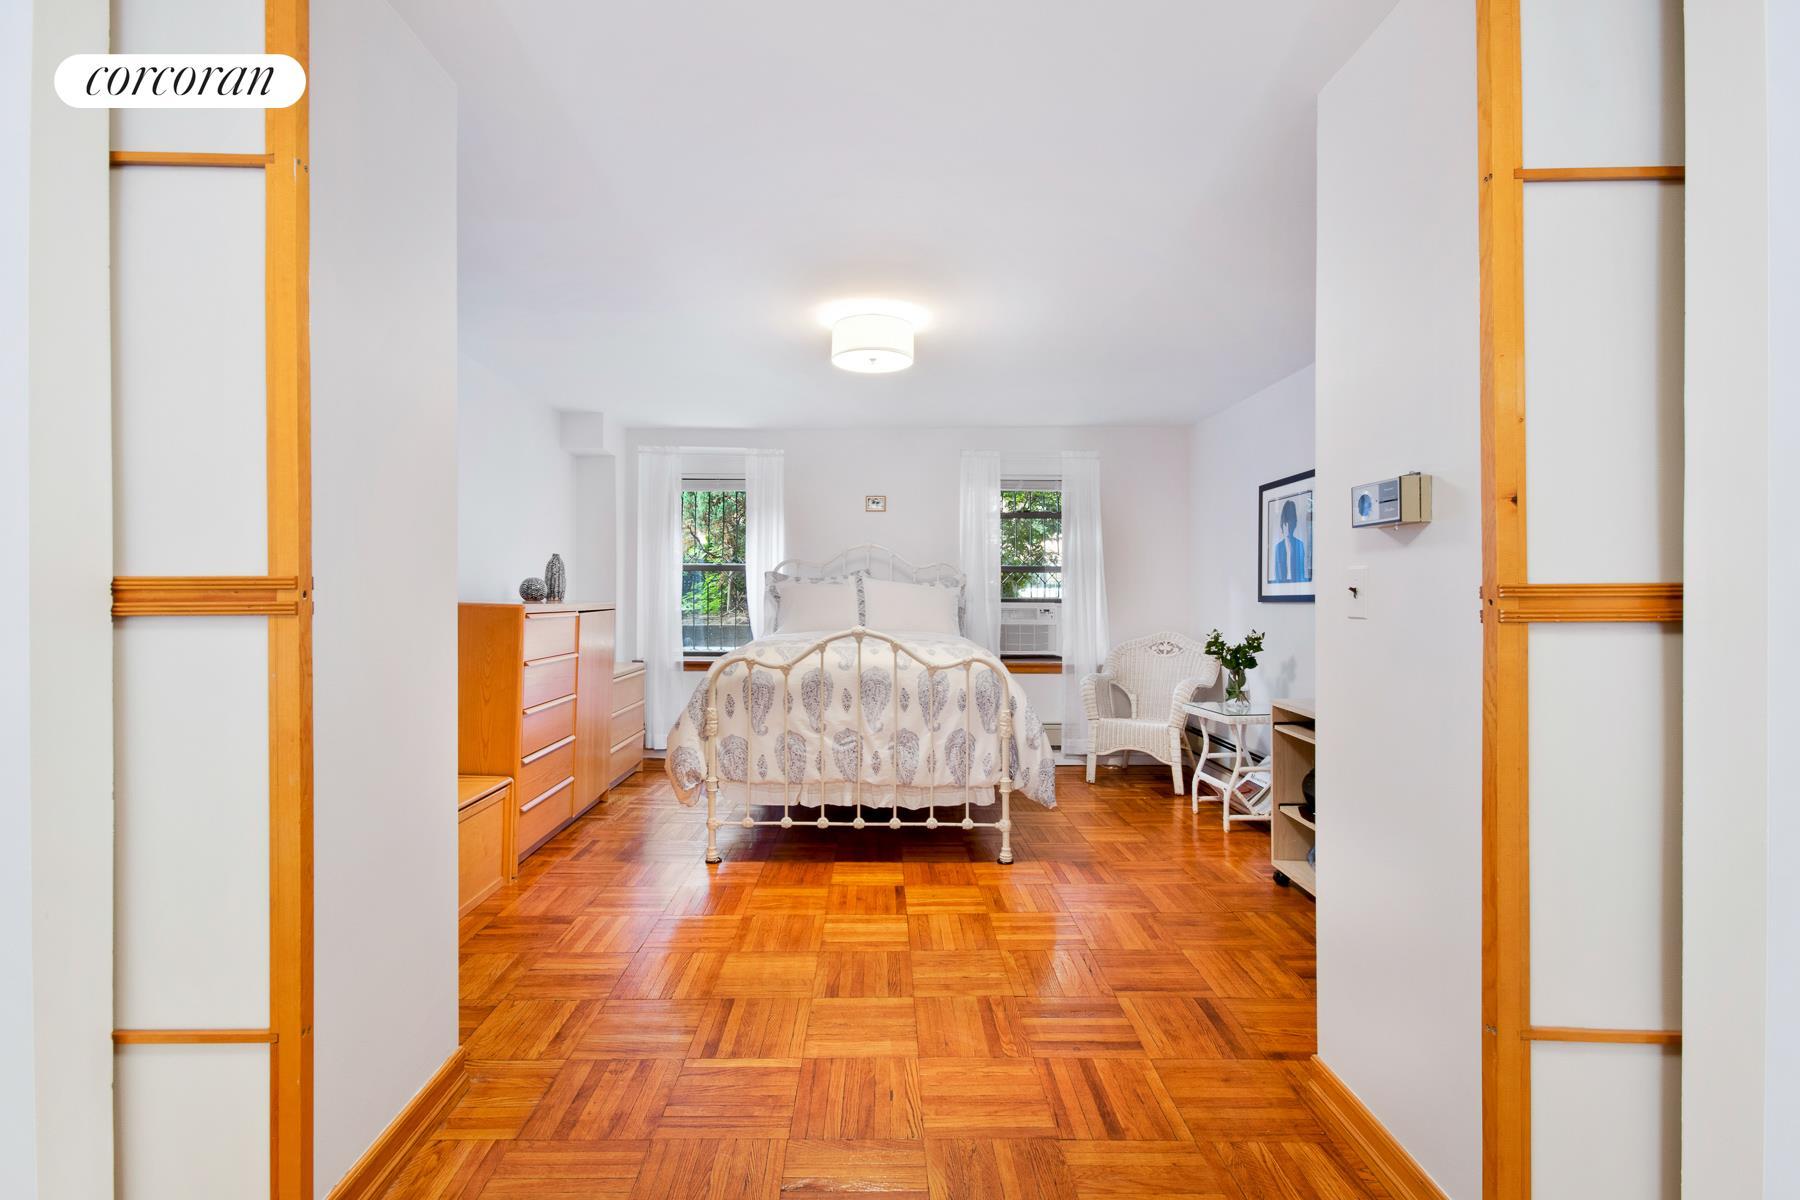 Corcoran, 487 3rd Street, Apt. 1, Park Slope Real Estate, Brooklyn ...